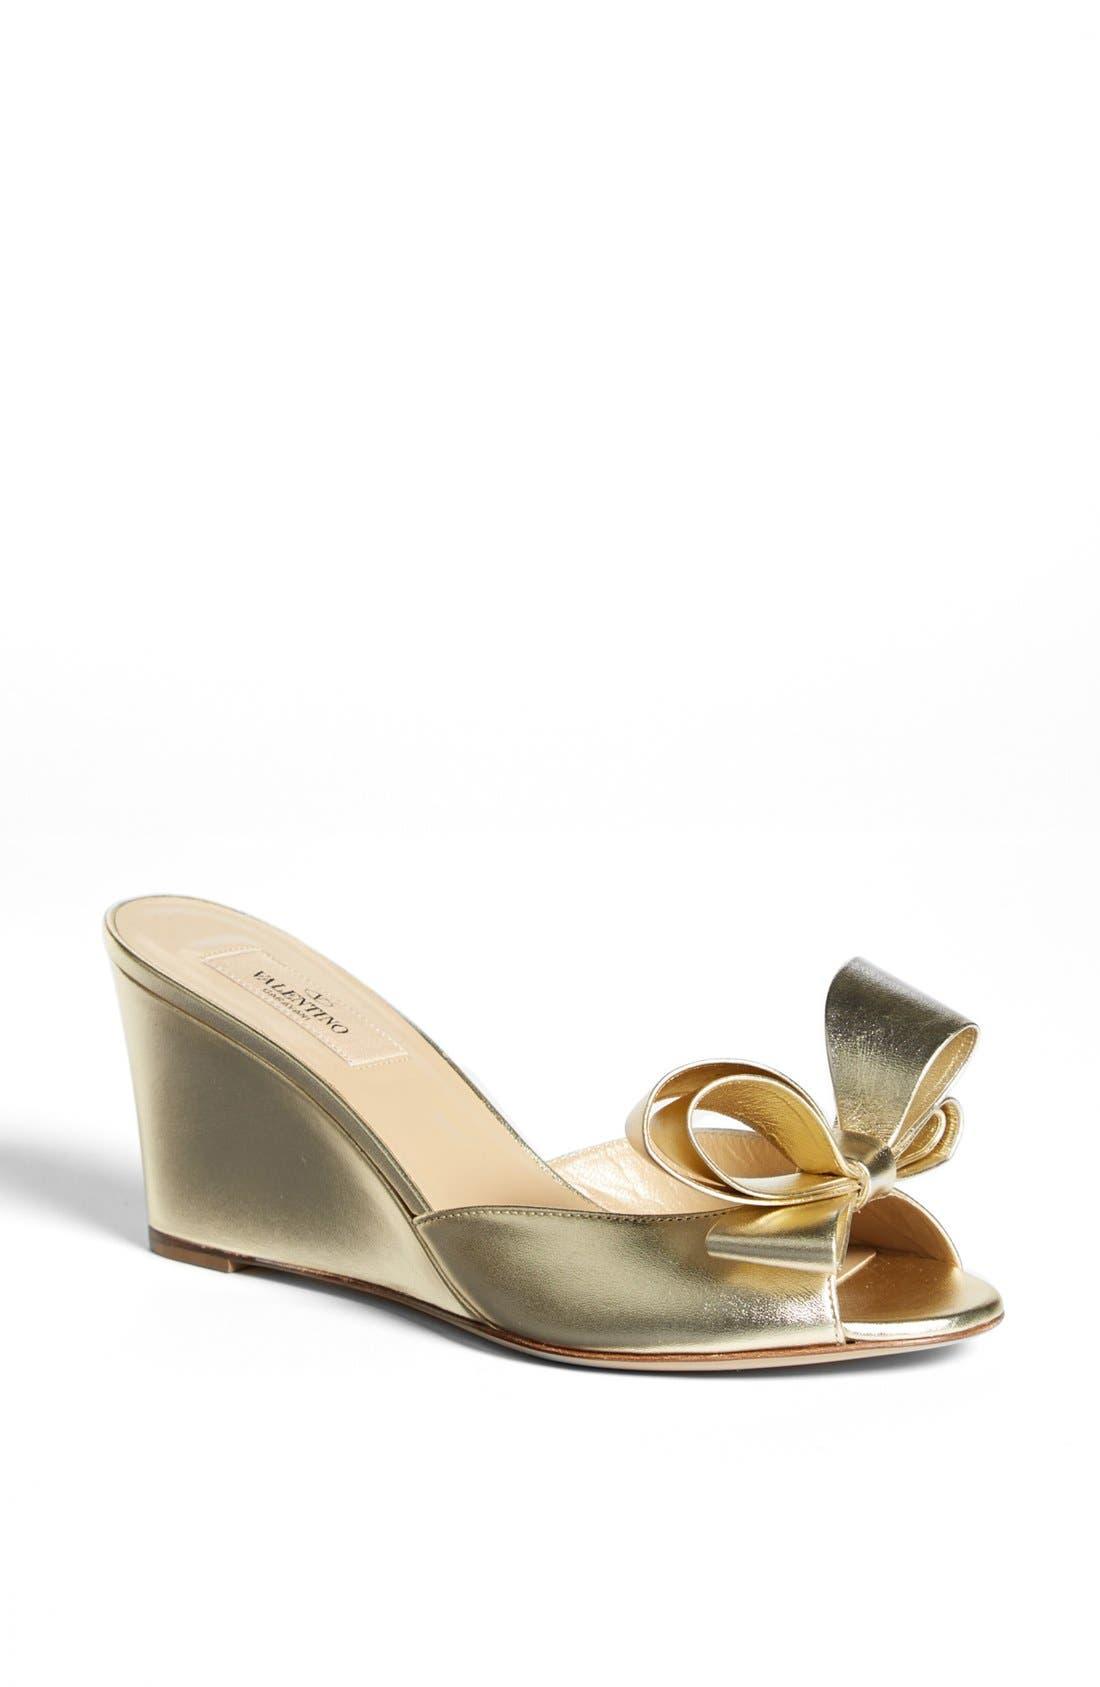 Alternate Image 1 Selected - Valentino Bow Wedge Sandal